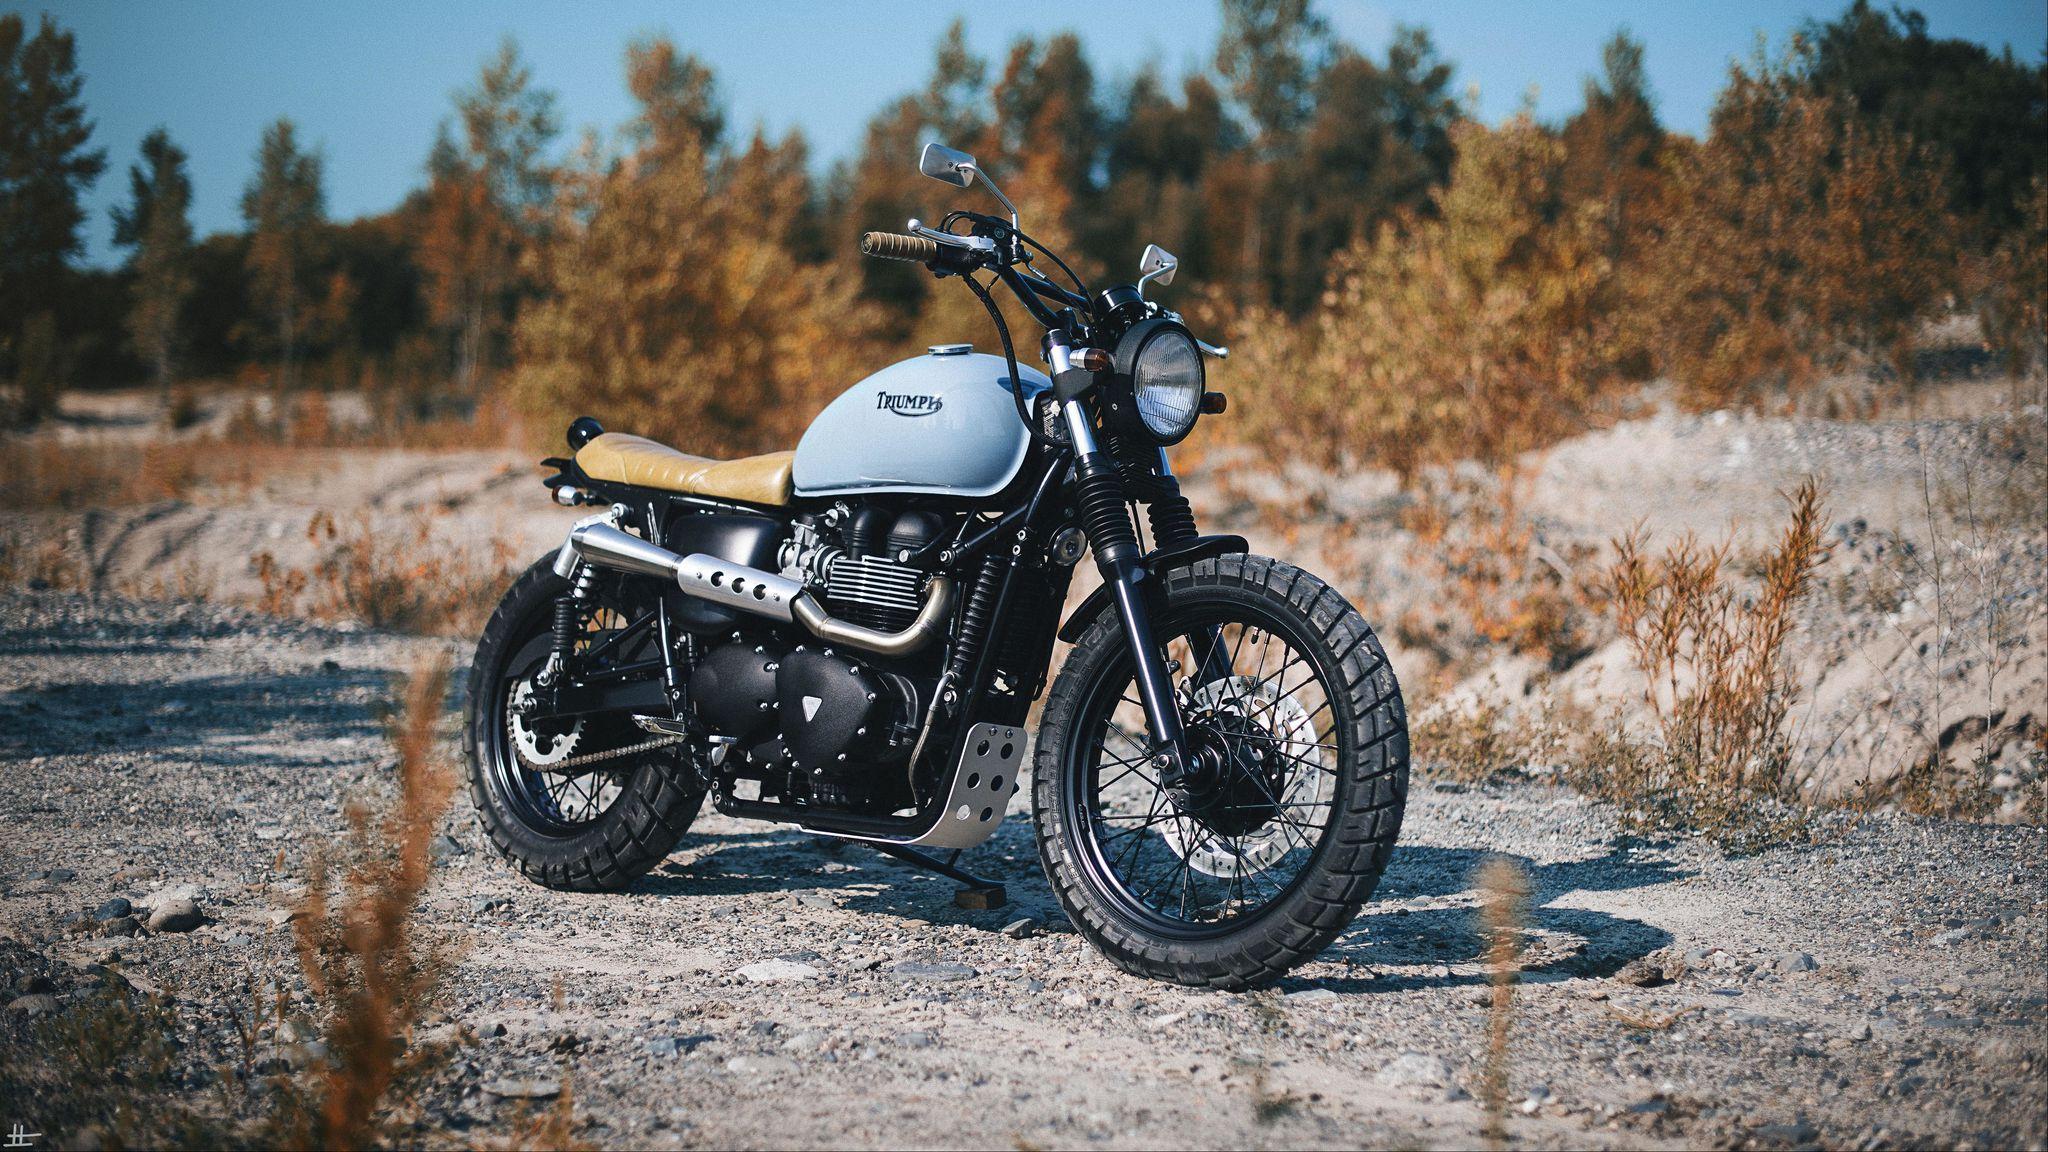 2048x1152 Обои triumph, bonneville, мотоцикл, вид сбоку